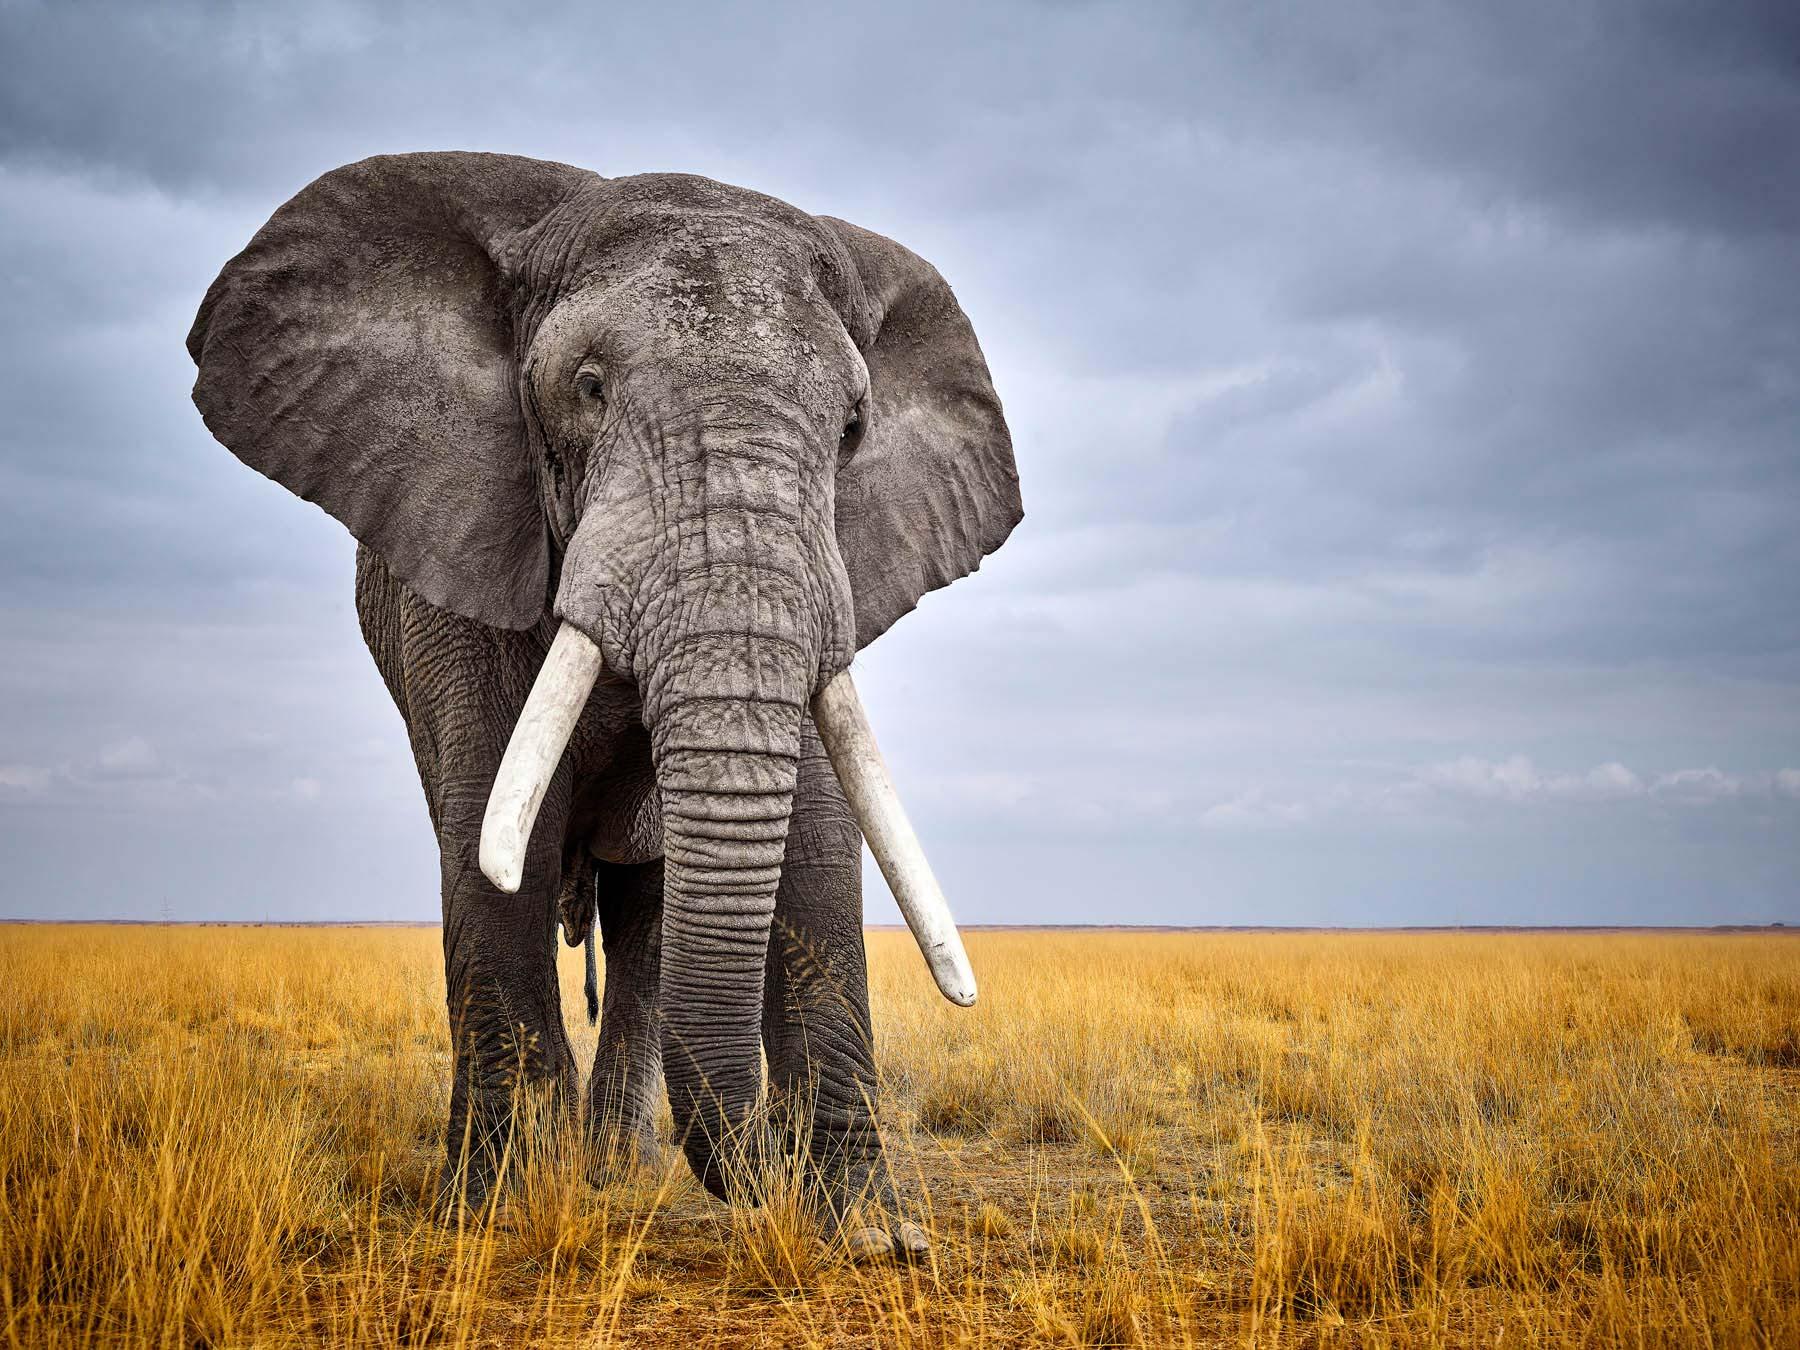 Bull elephant on the plain, Kenya.